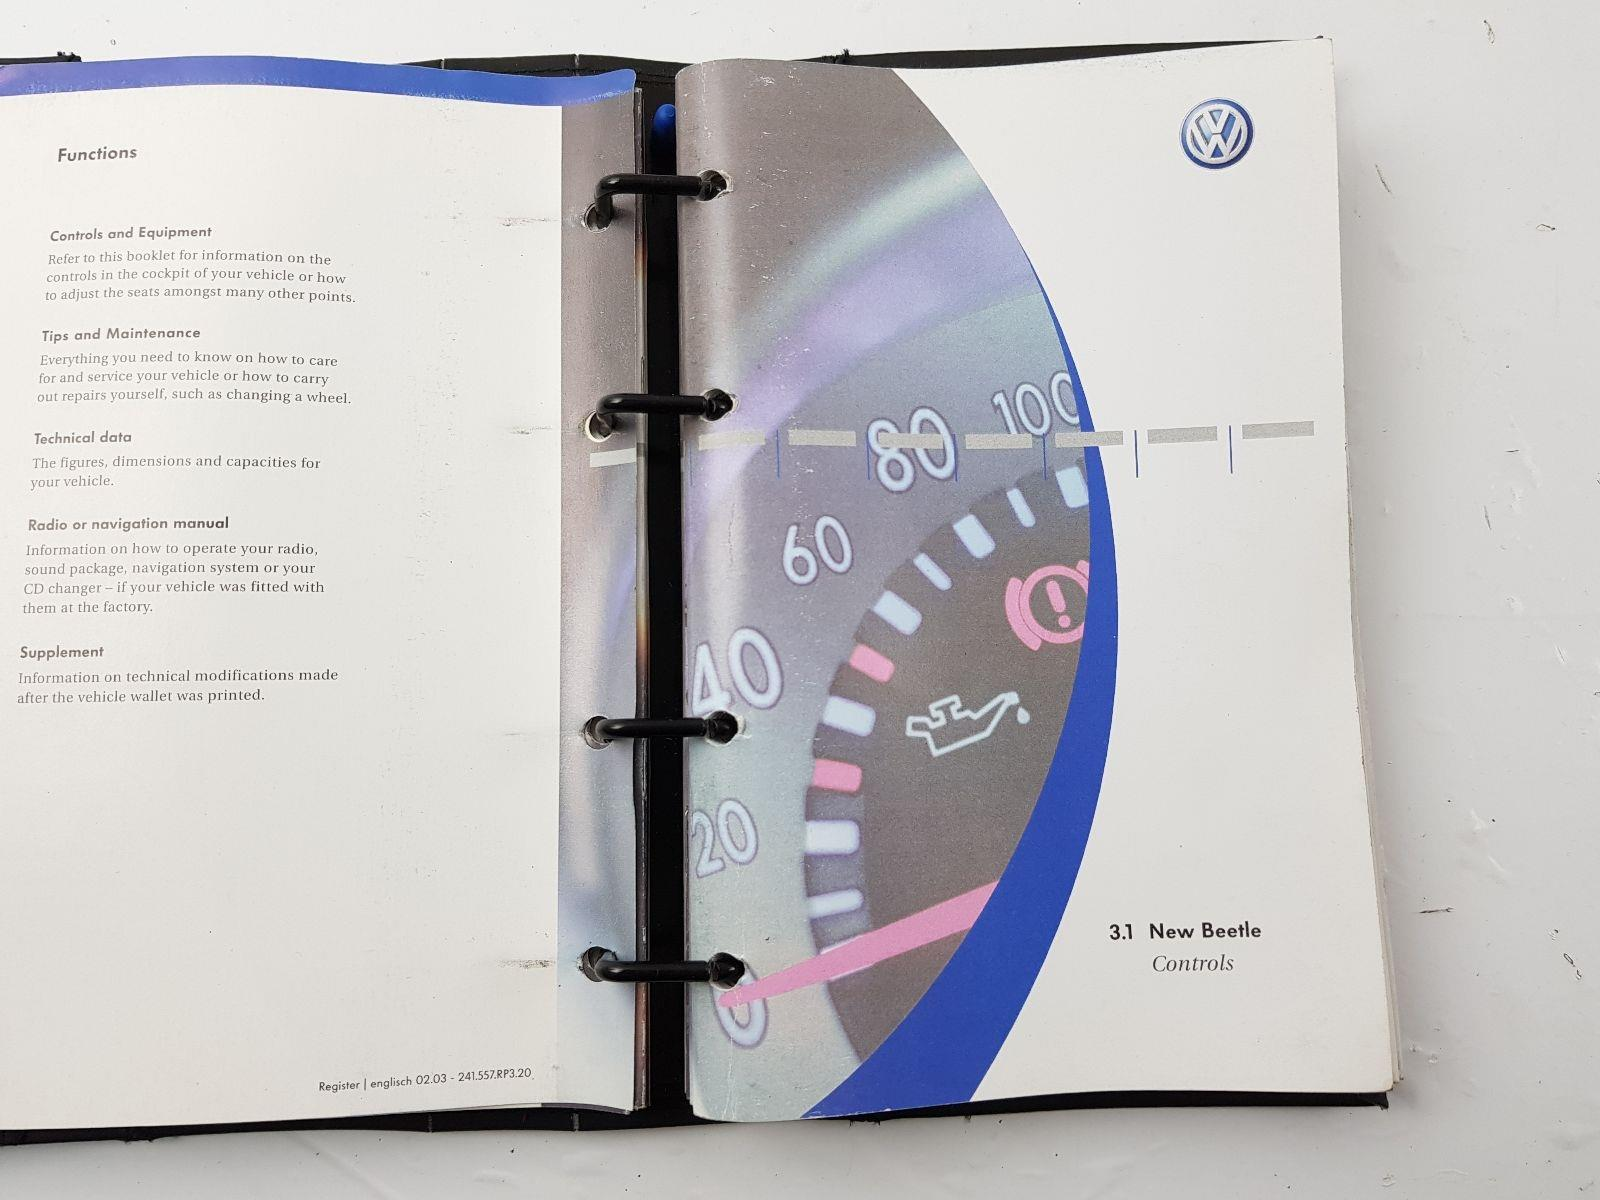 2000 vw beetle service manual pdf New Beetle Wiring Diagram Pdf on